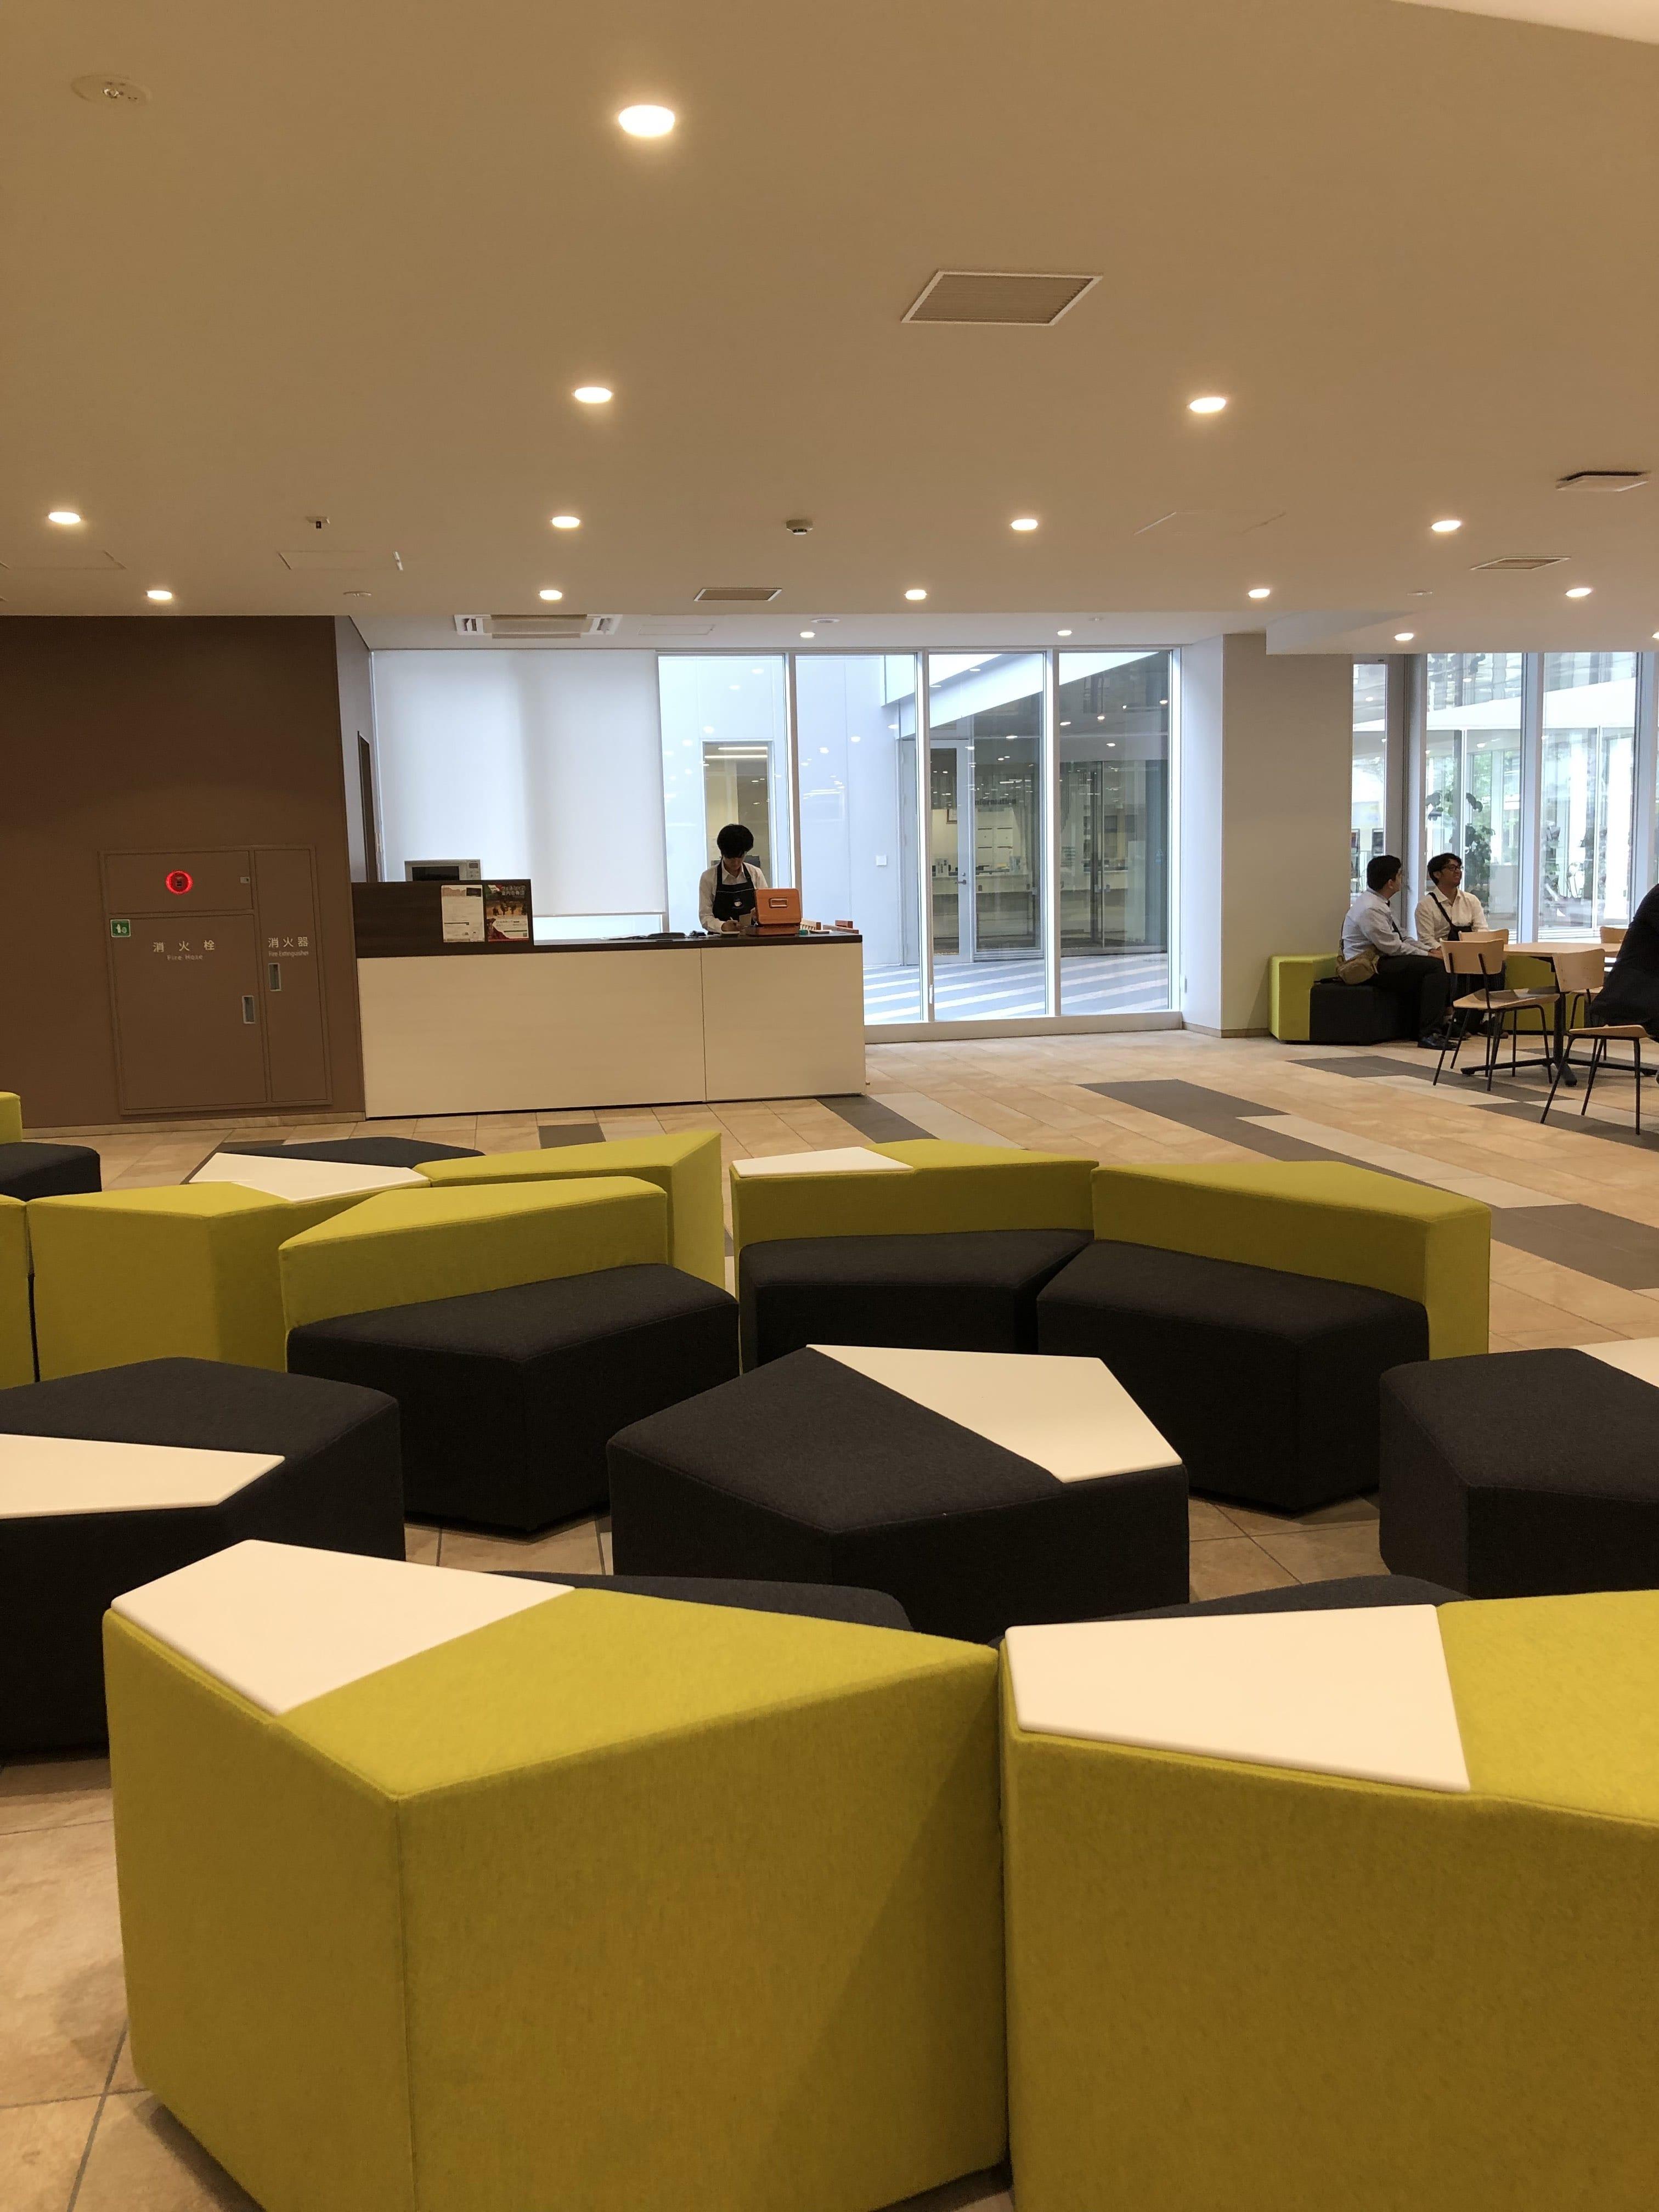 Oberlin University - Shinjuku Campus - photo 6